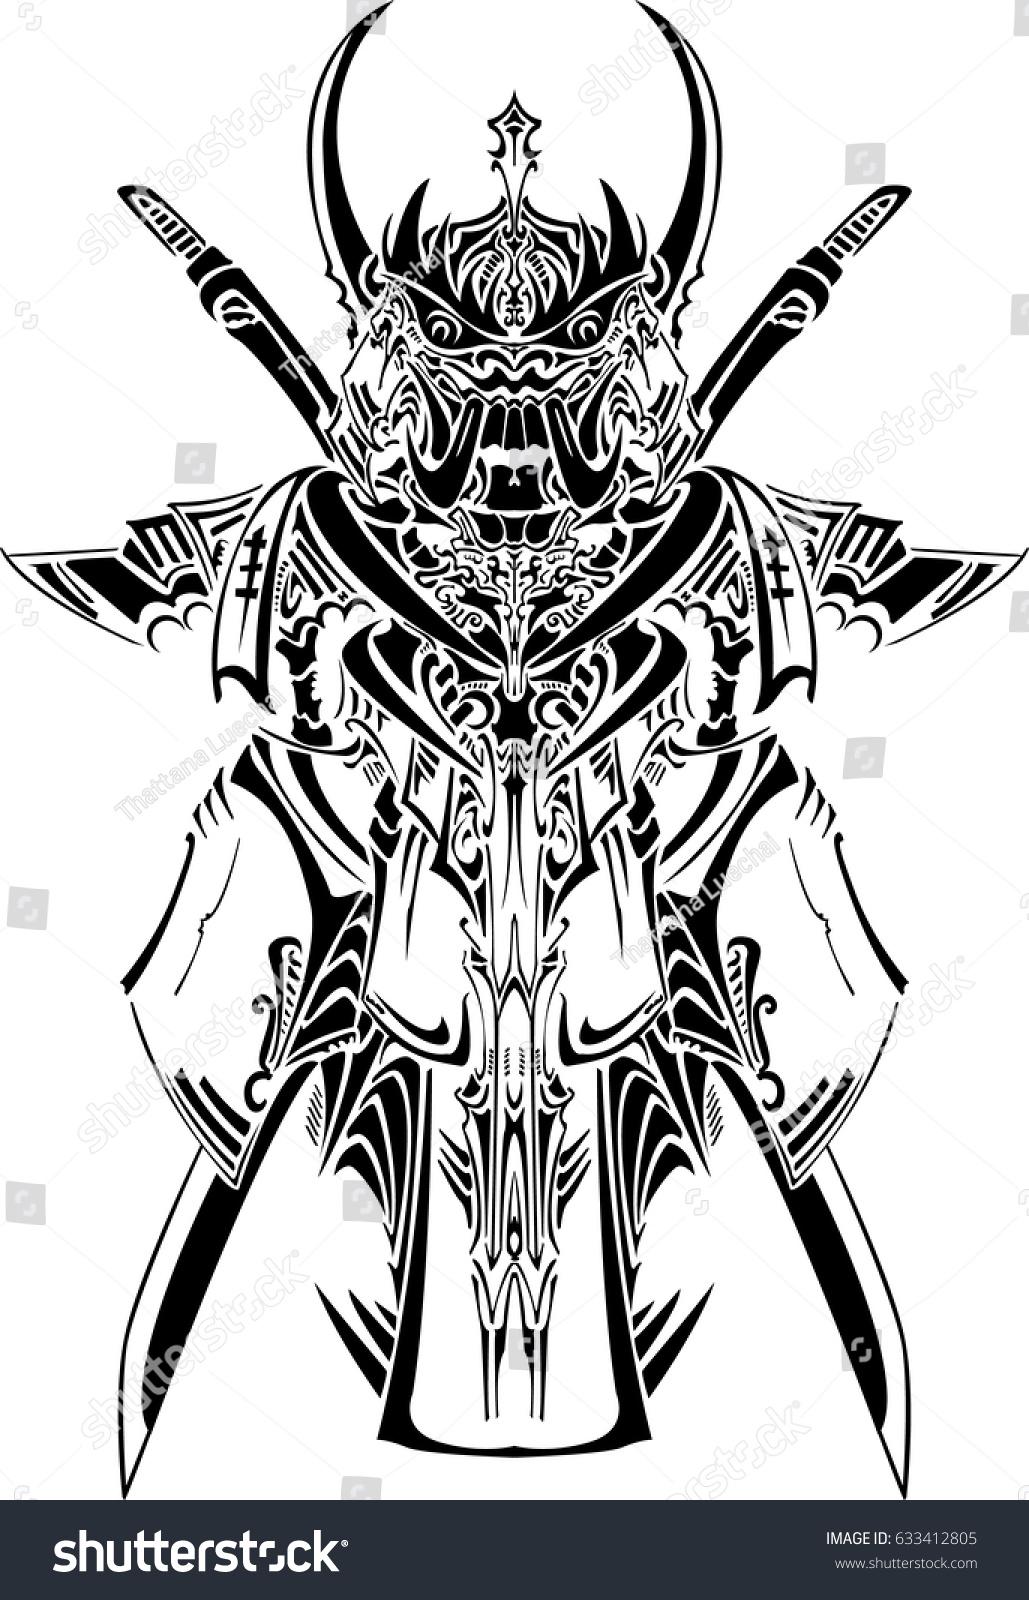 Vector Tribal Samurai Mask Tattoo Stock Vector Royalty Free 633412805